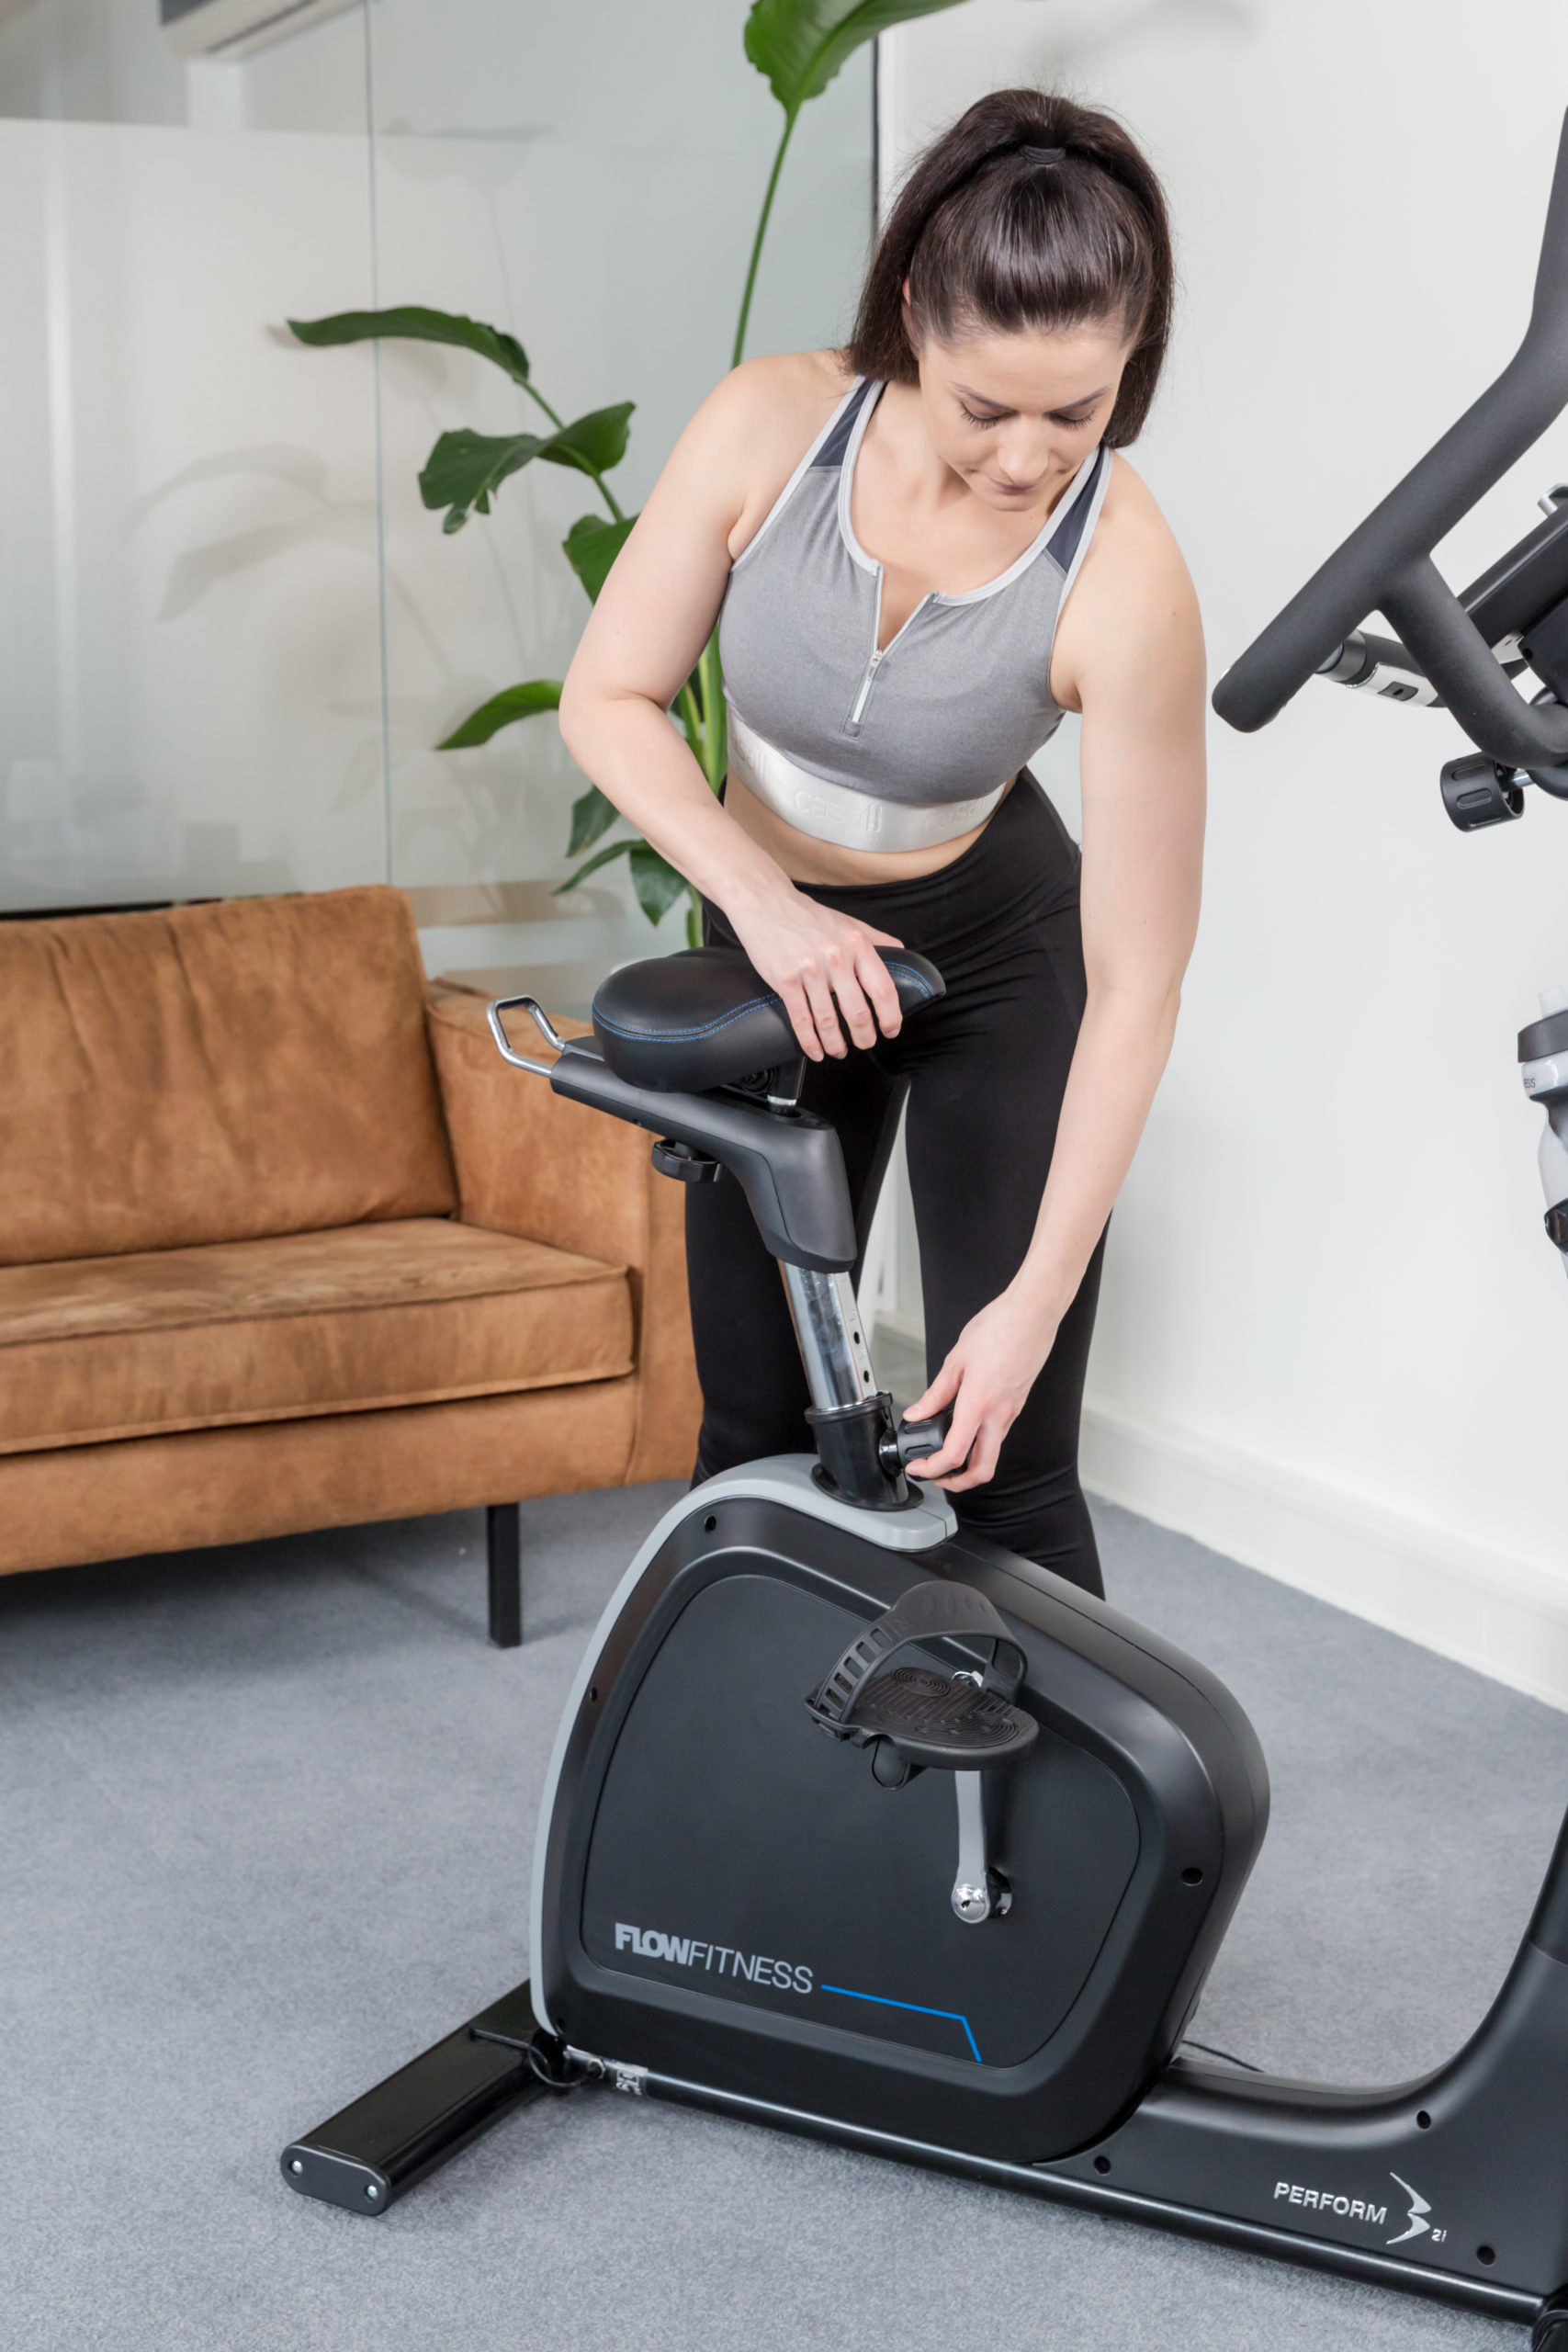 Flow Fitness Tabel PERFORM B2i Ergometer 3